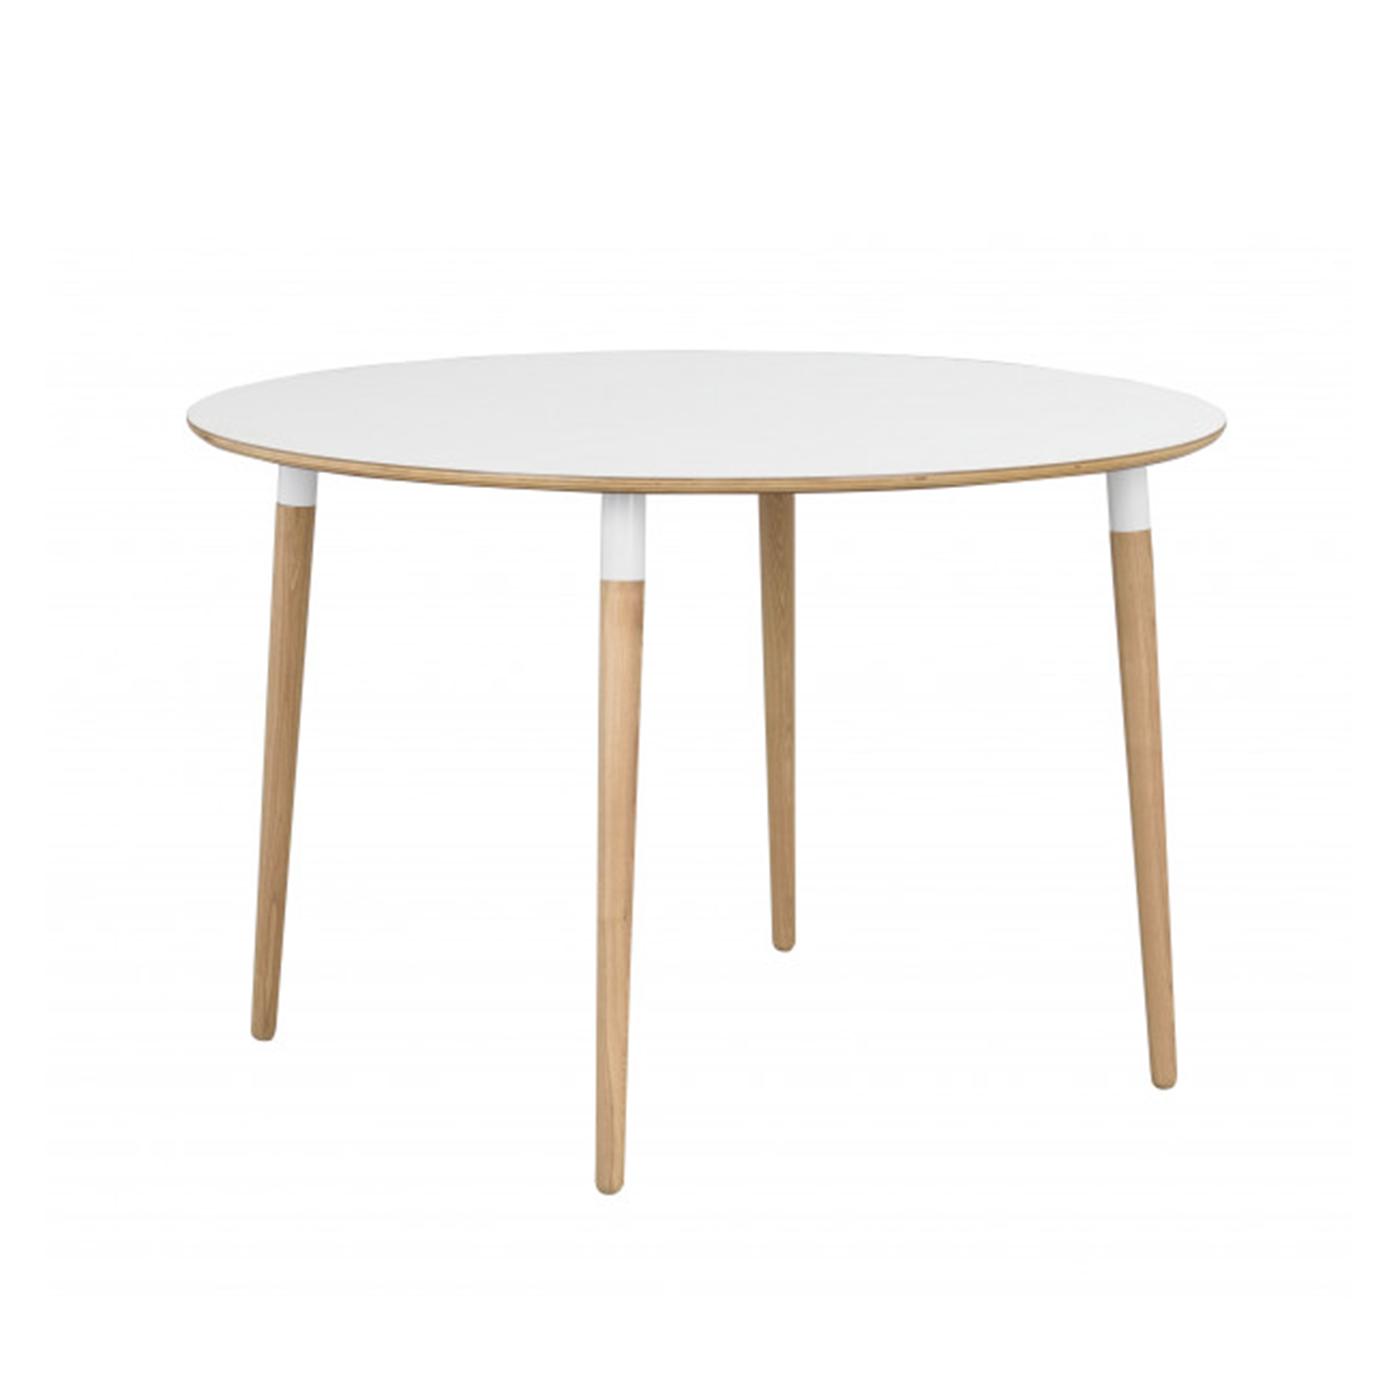 Ronde Eettafel Scandinavisch.Nordiq Fusion Table Ronde Eettafel 115 Cm Eiken Poten